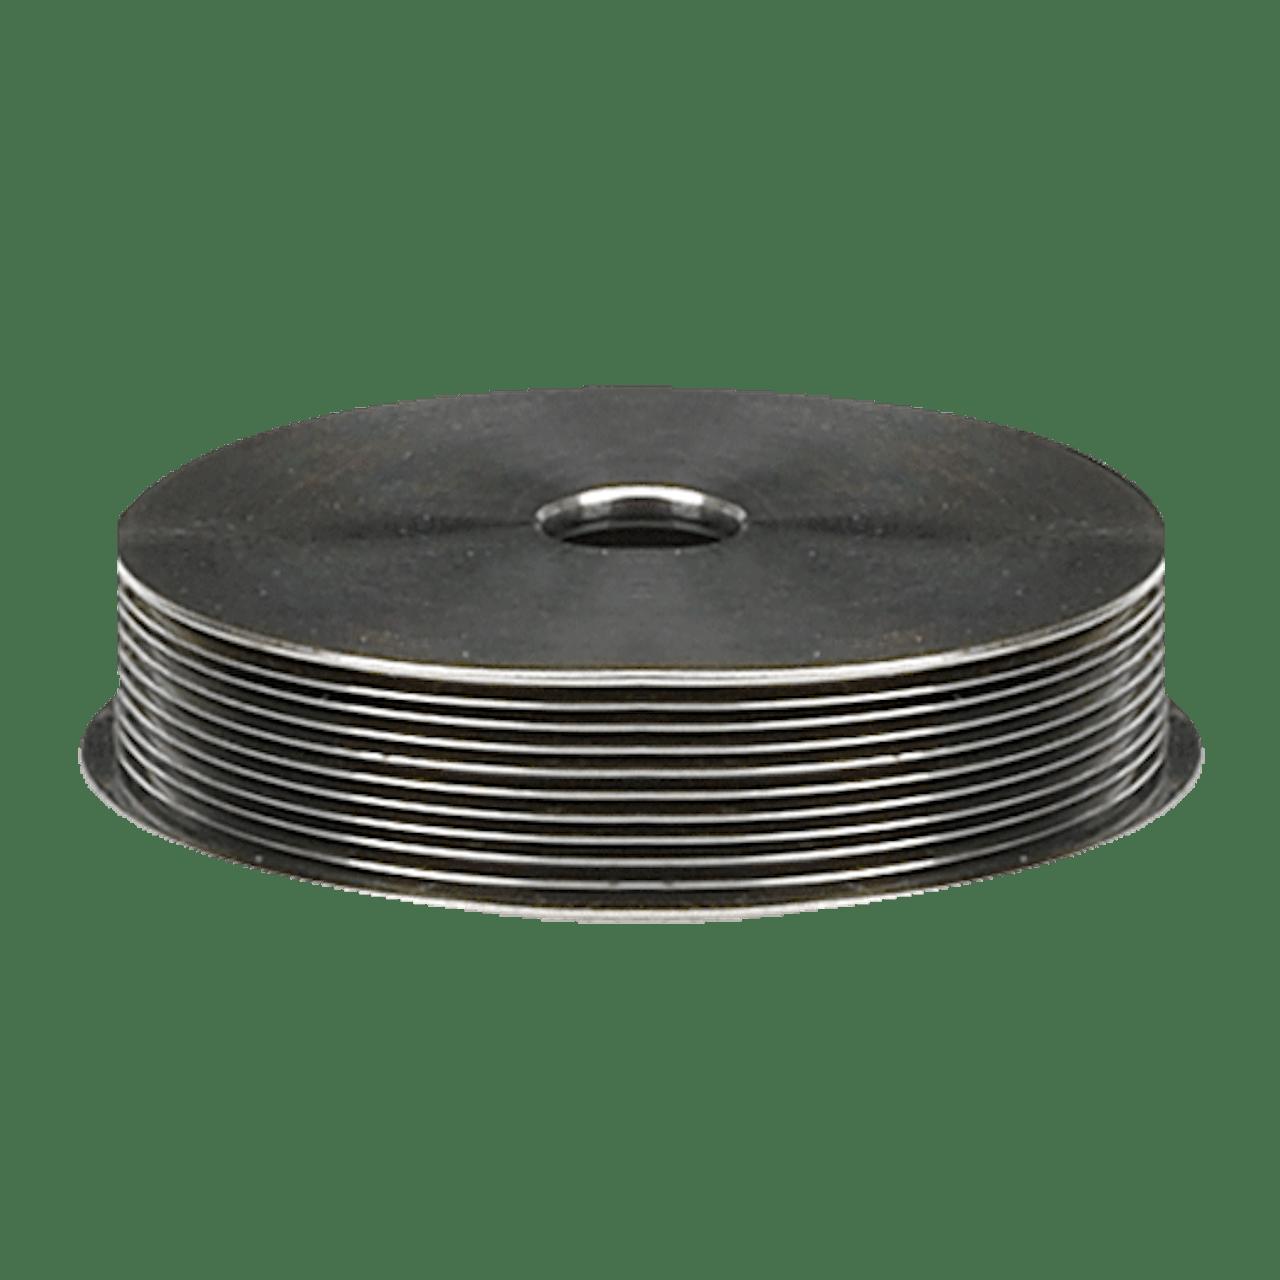 Volume compensator bellows